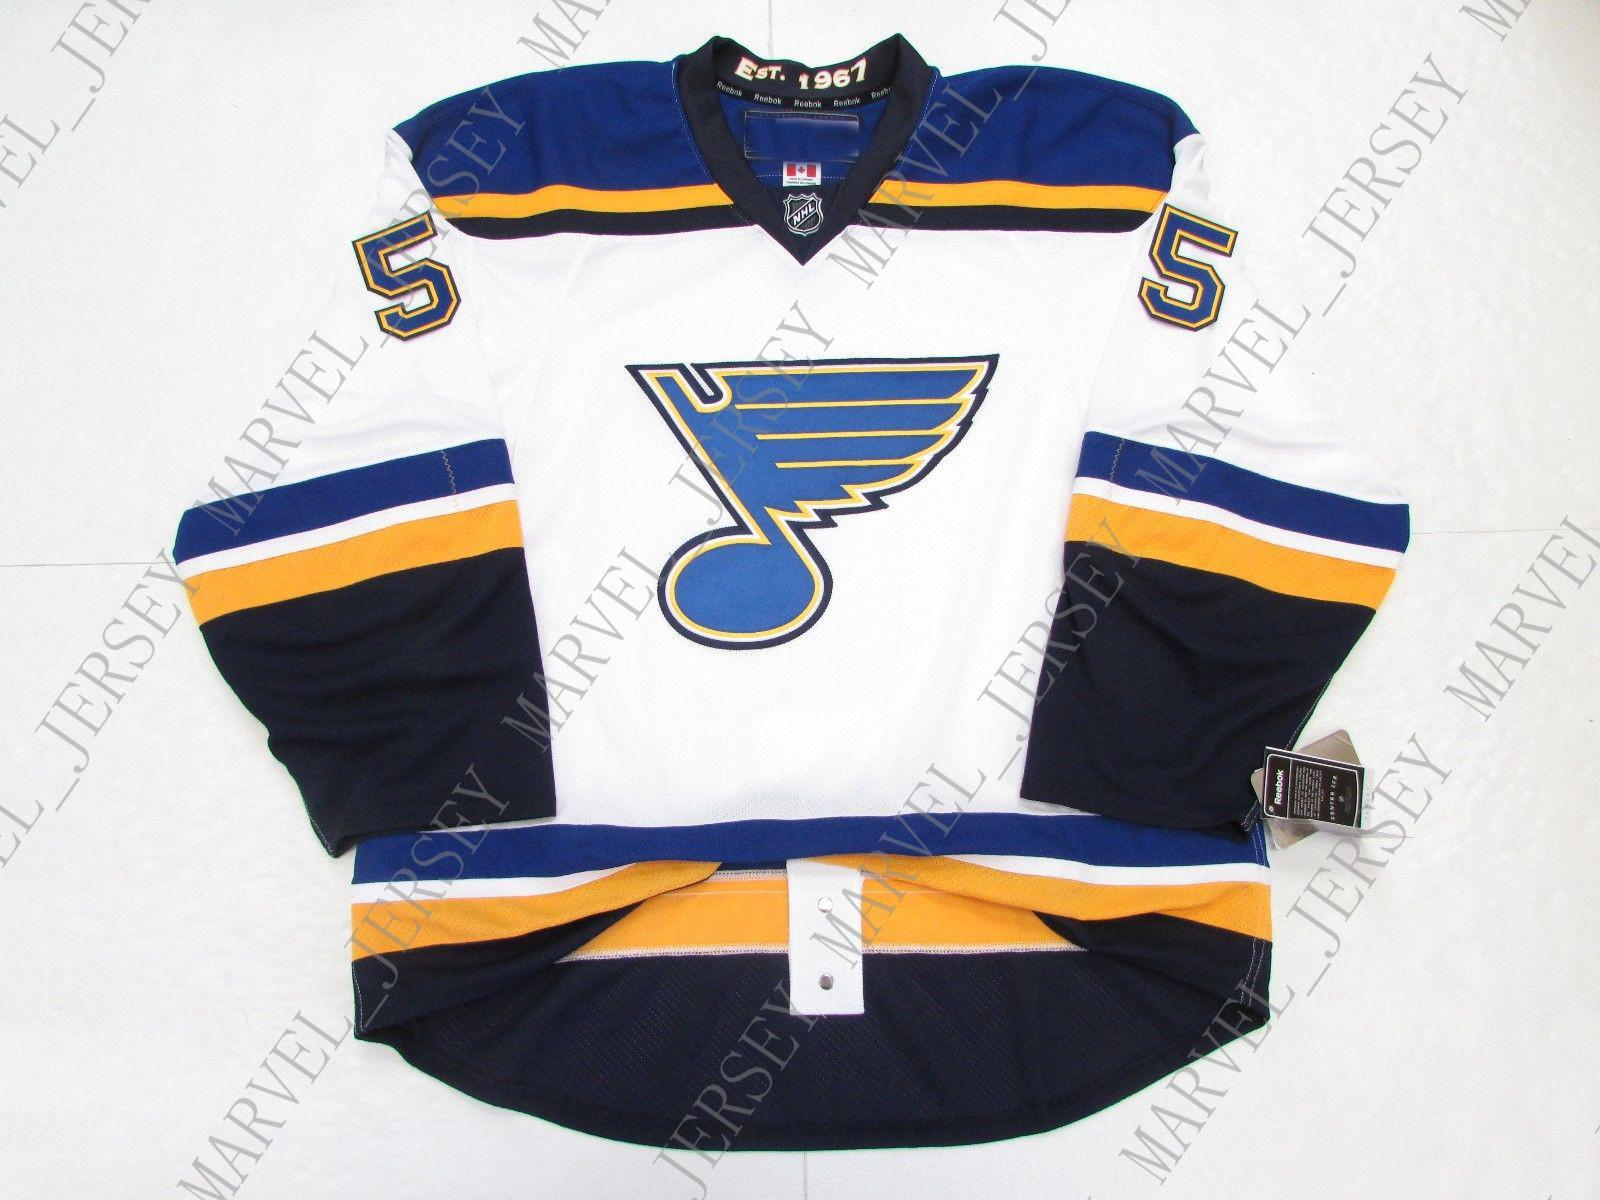 sale retailer ebdb2 e4777 Cheap custom COLTON PARAYKO ST. LOUIS BLUES AWAY HOCKEY JERSEY stitch add  any number any name Mens Hockey Jersey XS-5XL